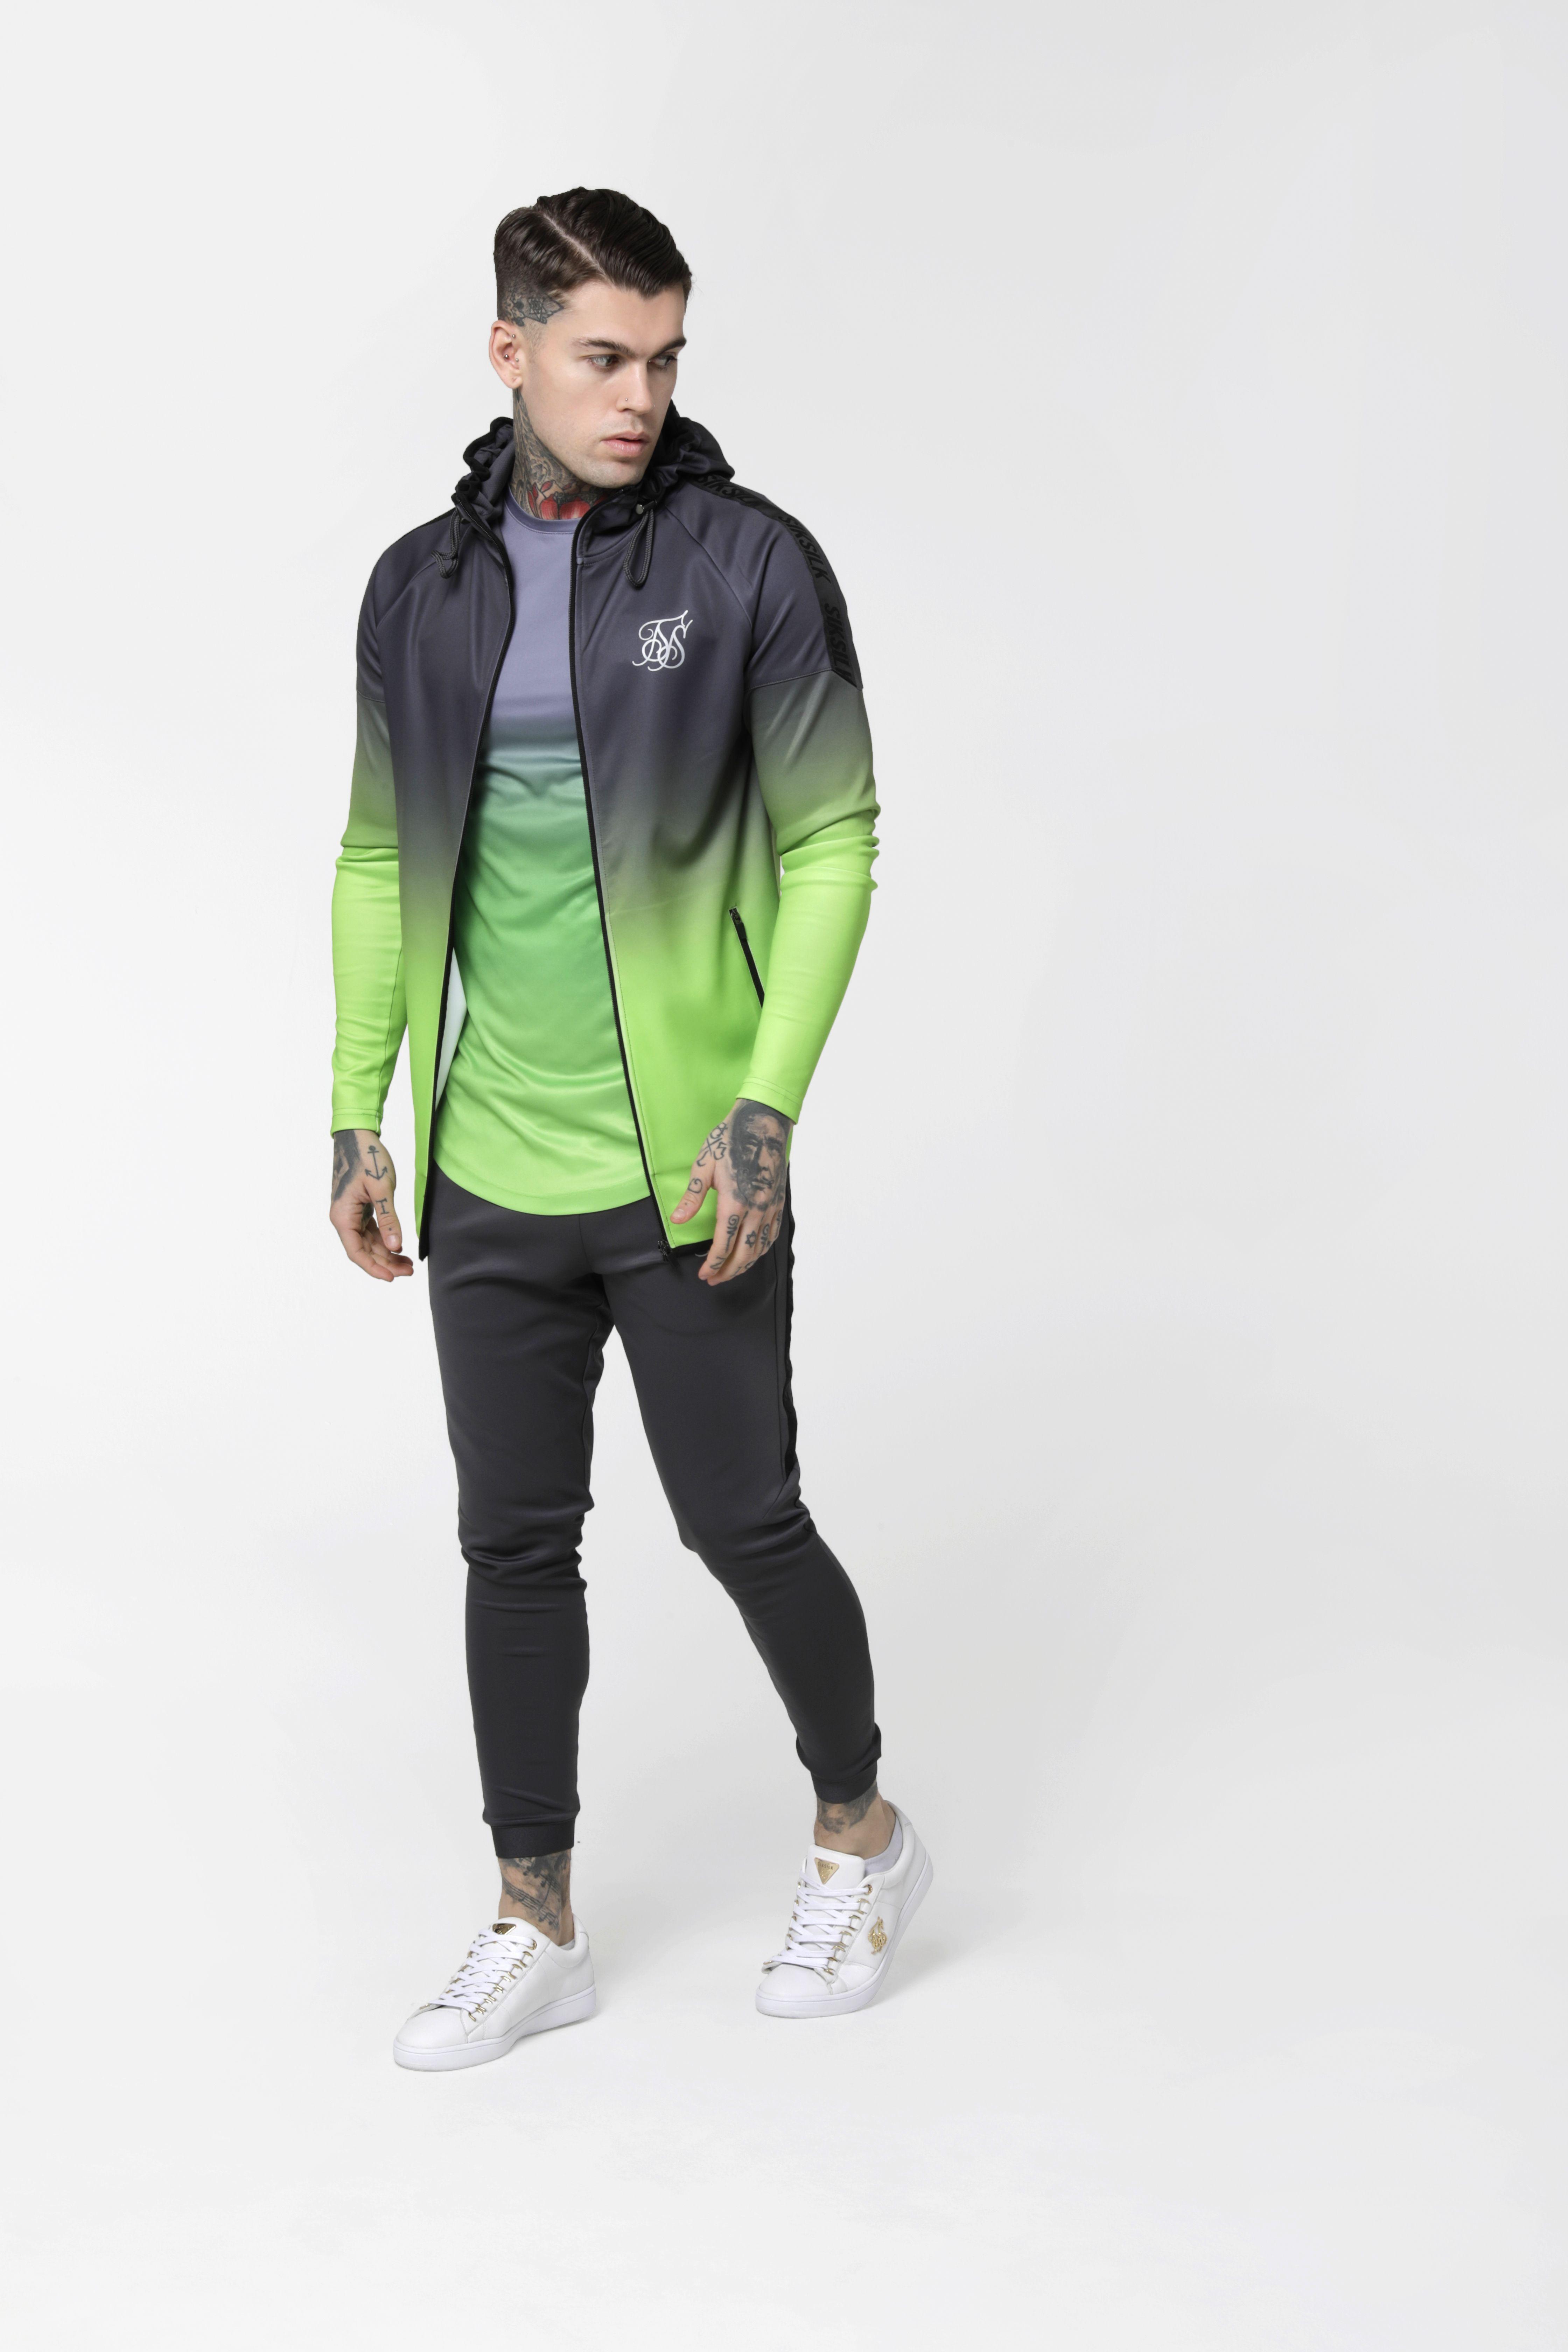 Raglan Athlete Fade Taped Hoodie Grey to Neon Green